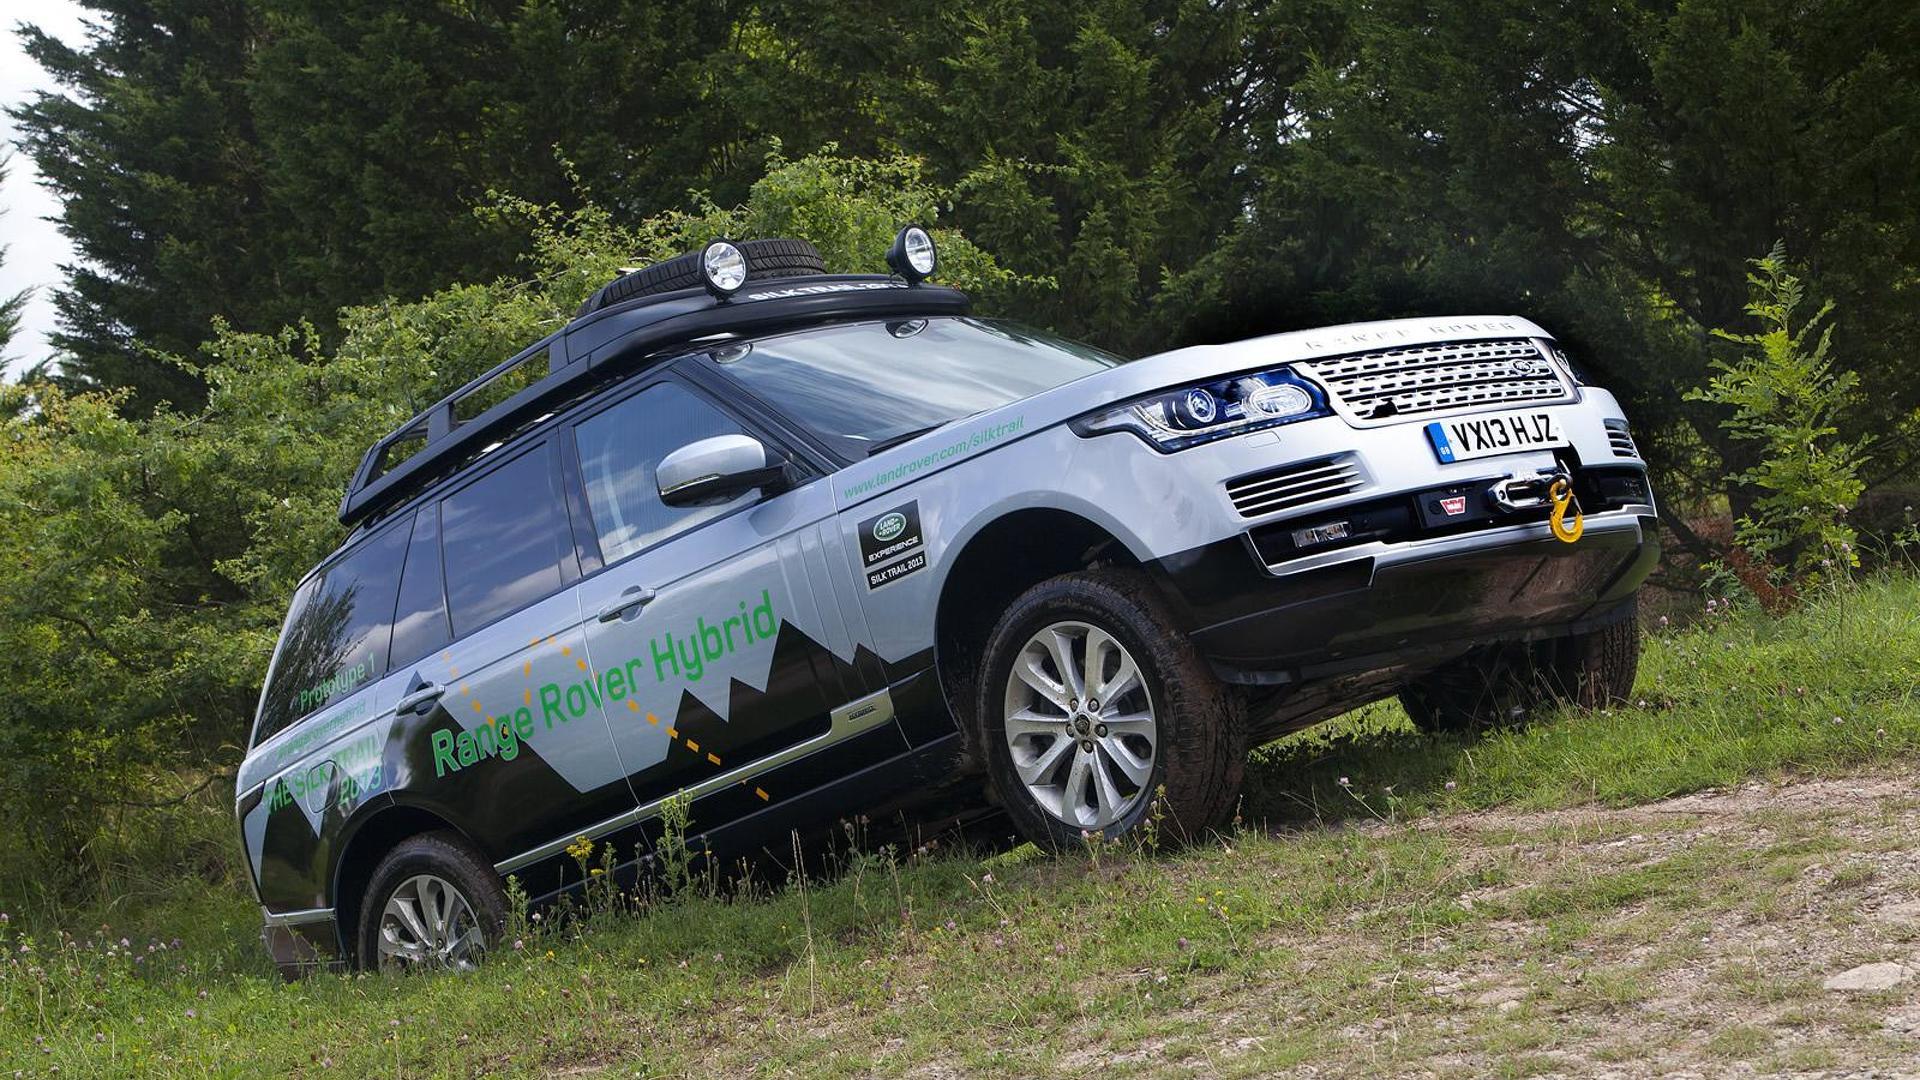 JLR SVO boss hints at an off-road focused Range Rover